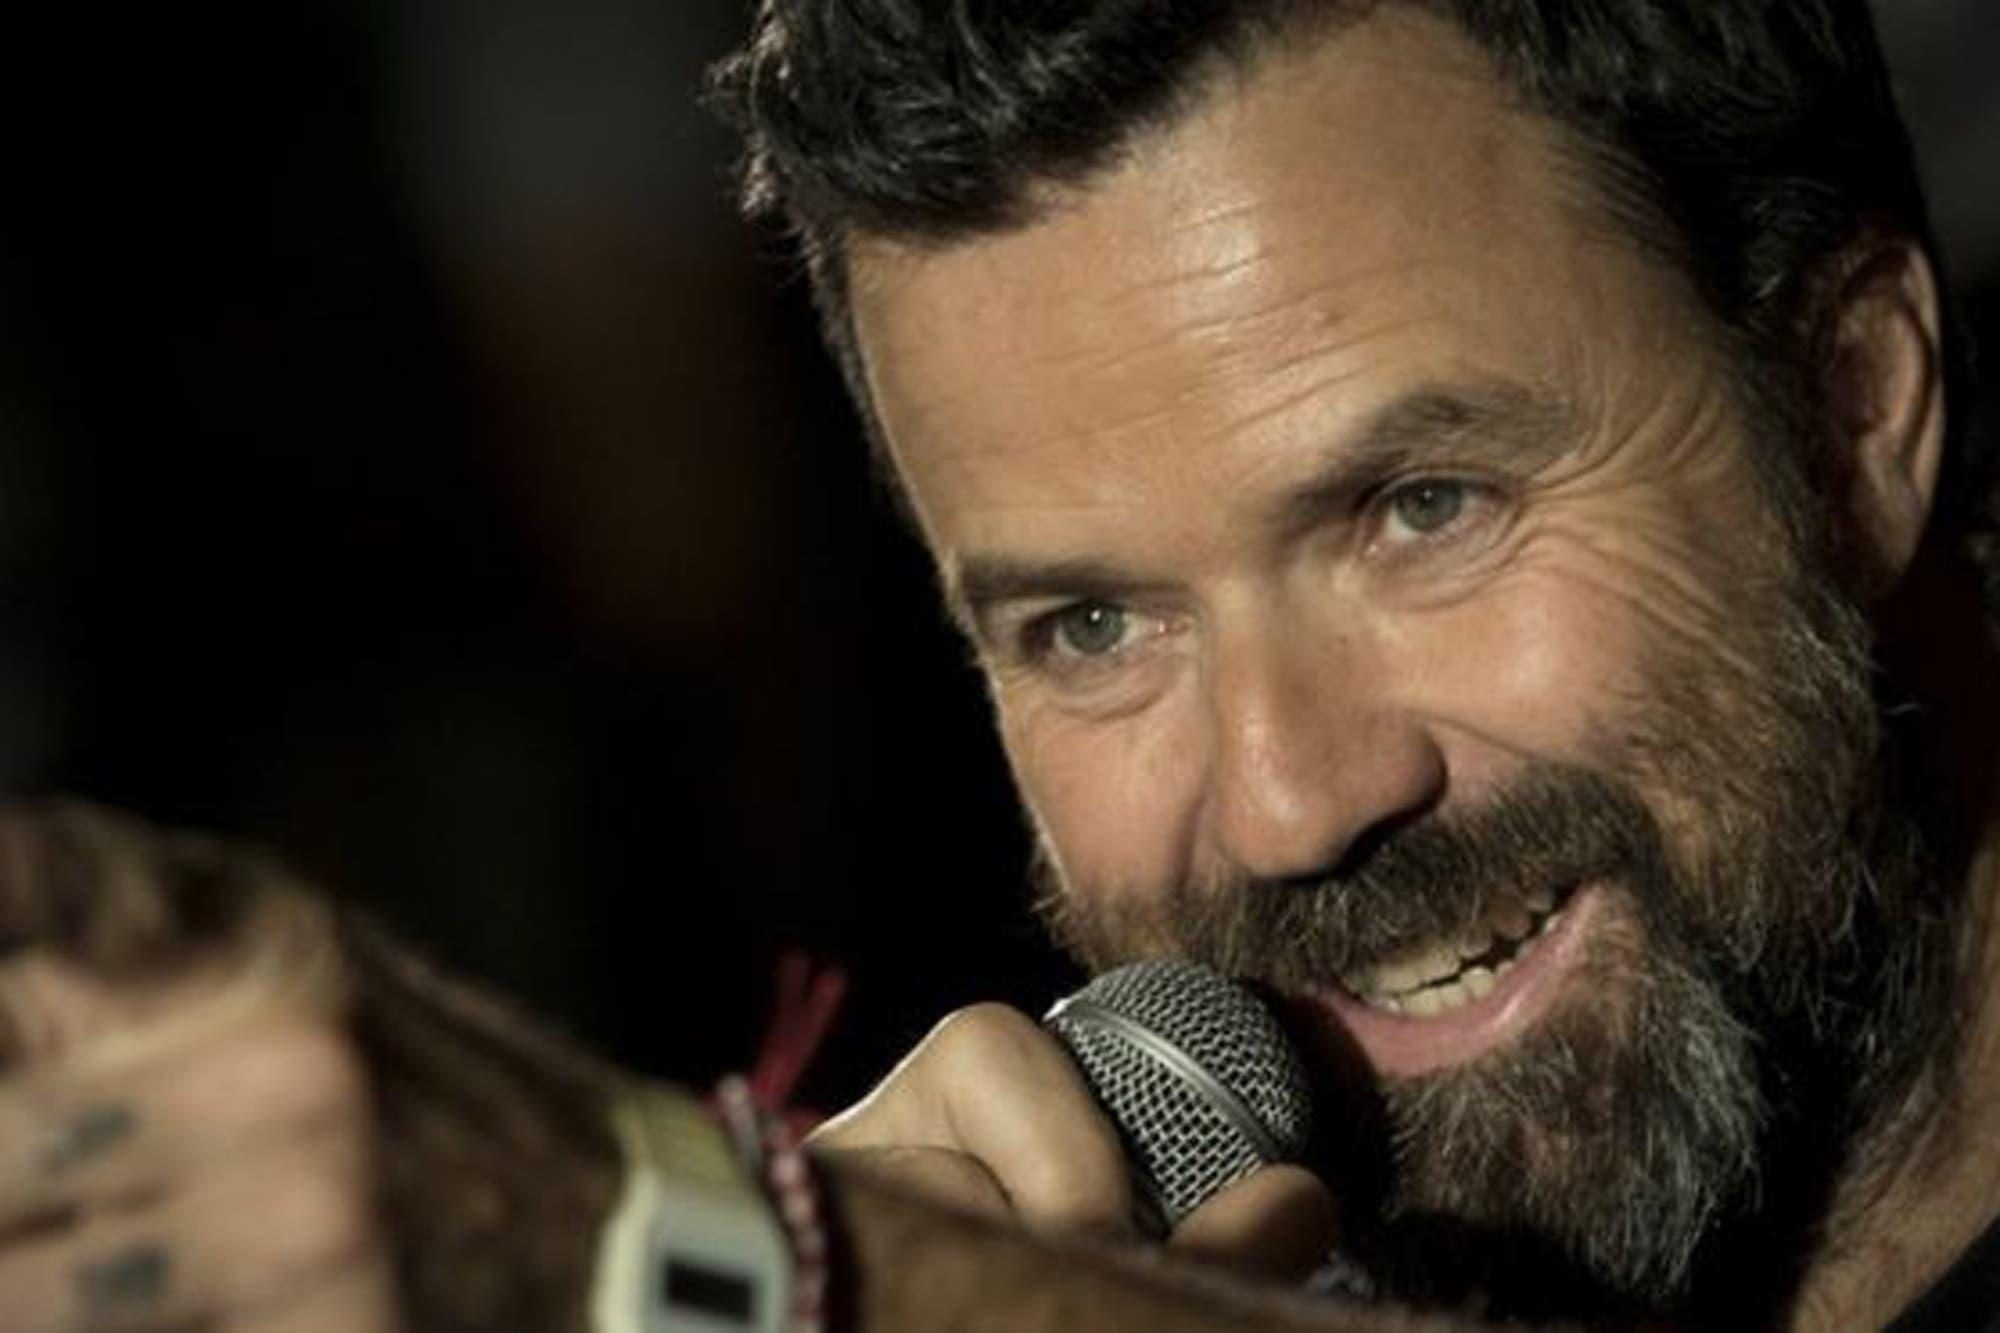 Murió Pau Donés, el cantante de la banda Jarabe de Palo